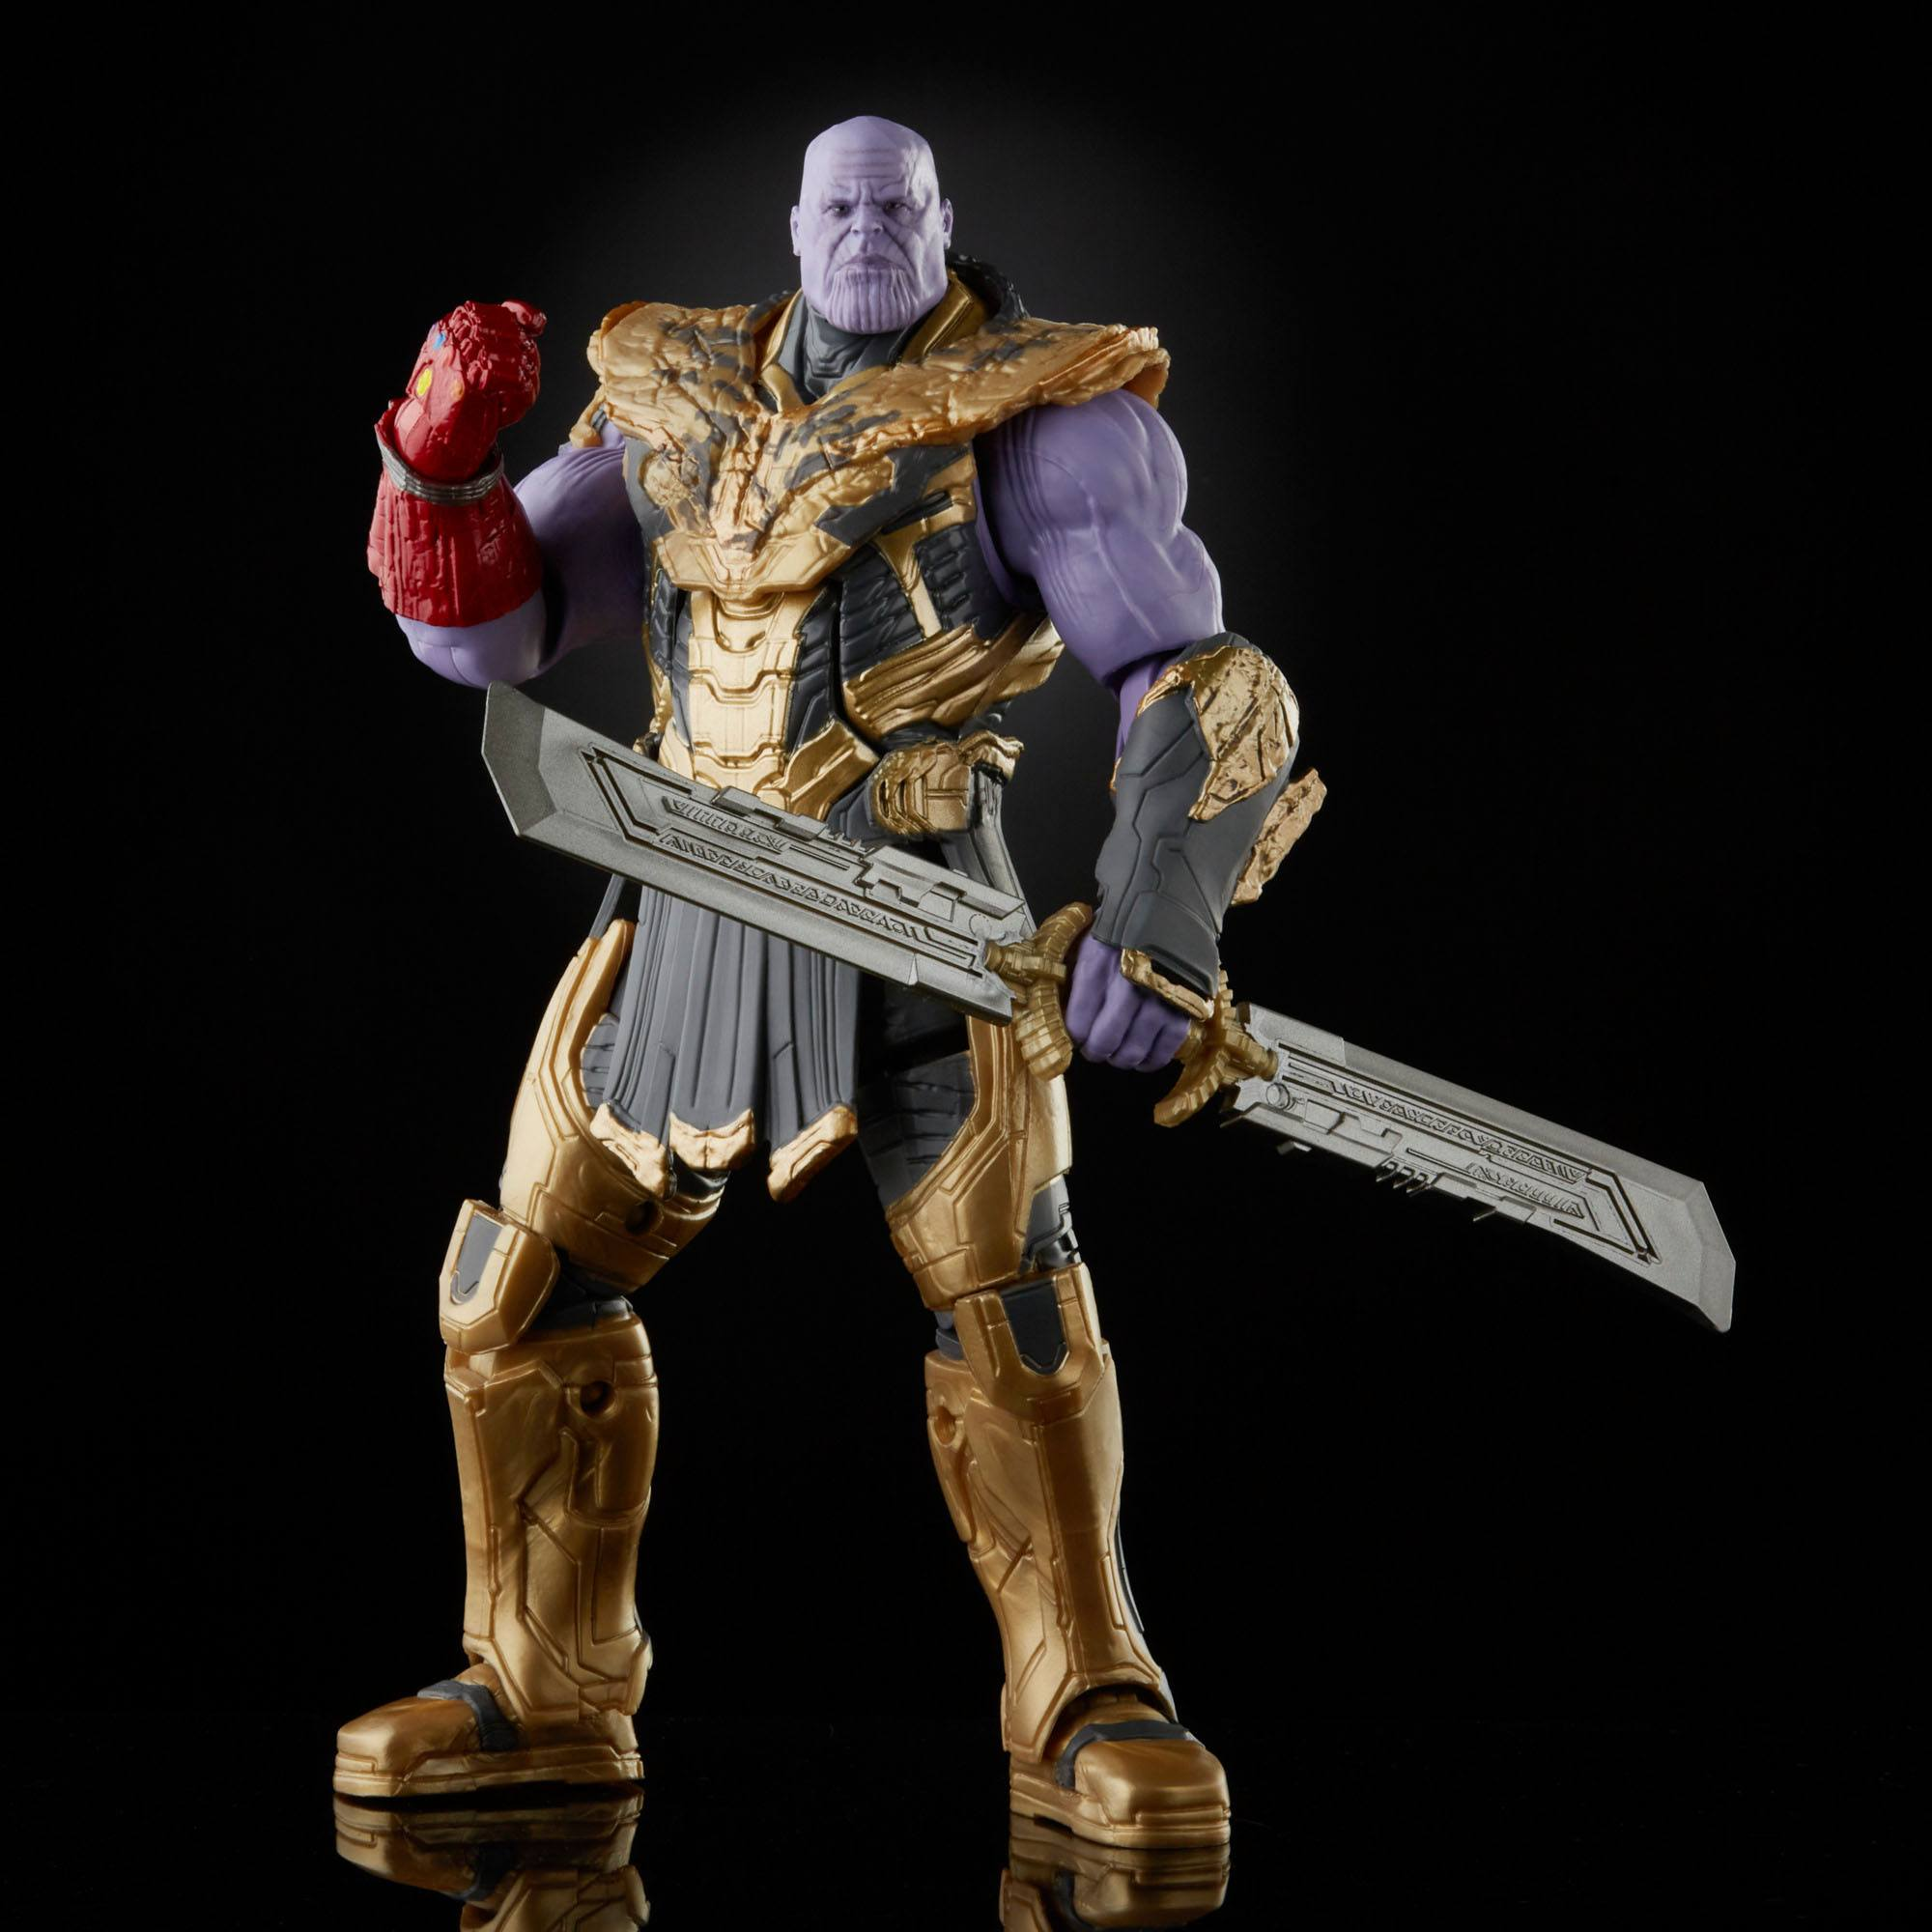 The Infinity Saga Marvel Legends Series Actionfiguren 2-Pack 2021 Iron Man & Thanos (Endgame) 15 cm F01925L0 5010993842353